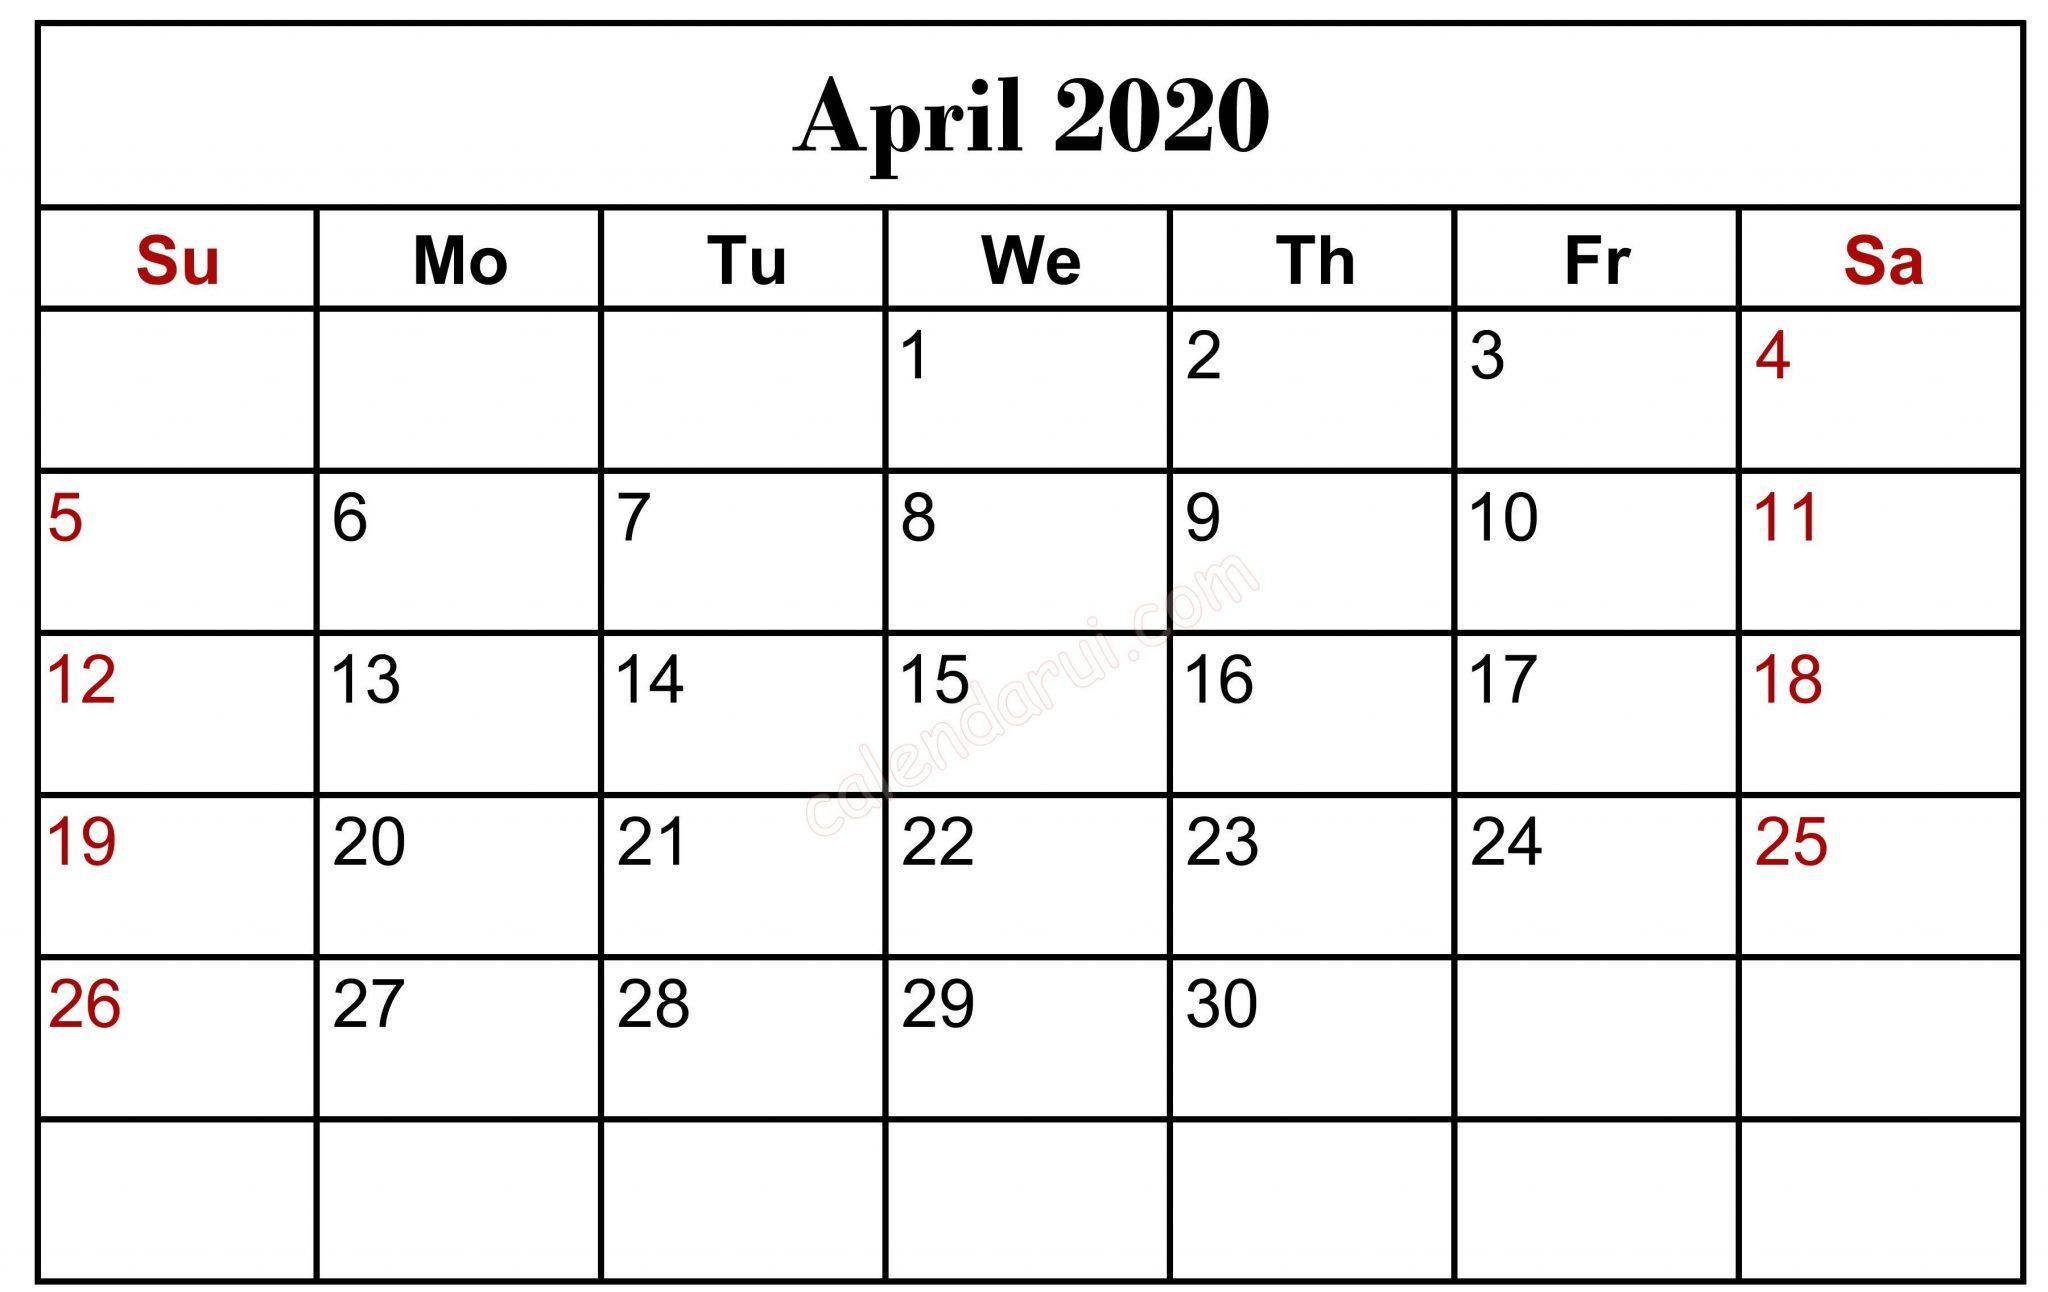 April 2020 Blank Calendar Printable